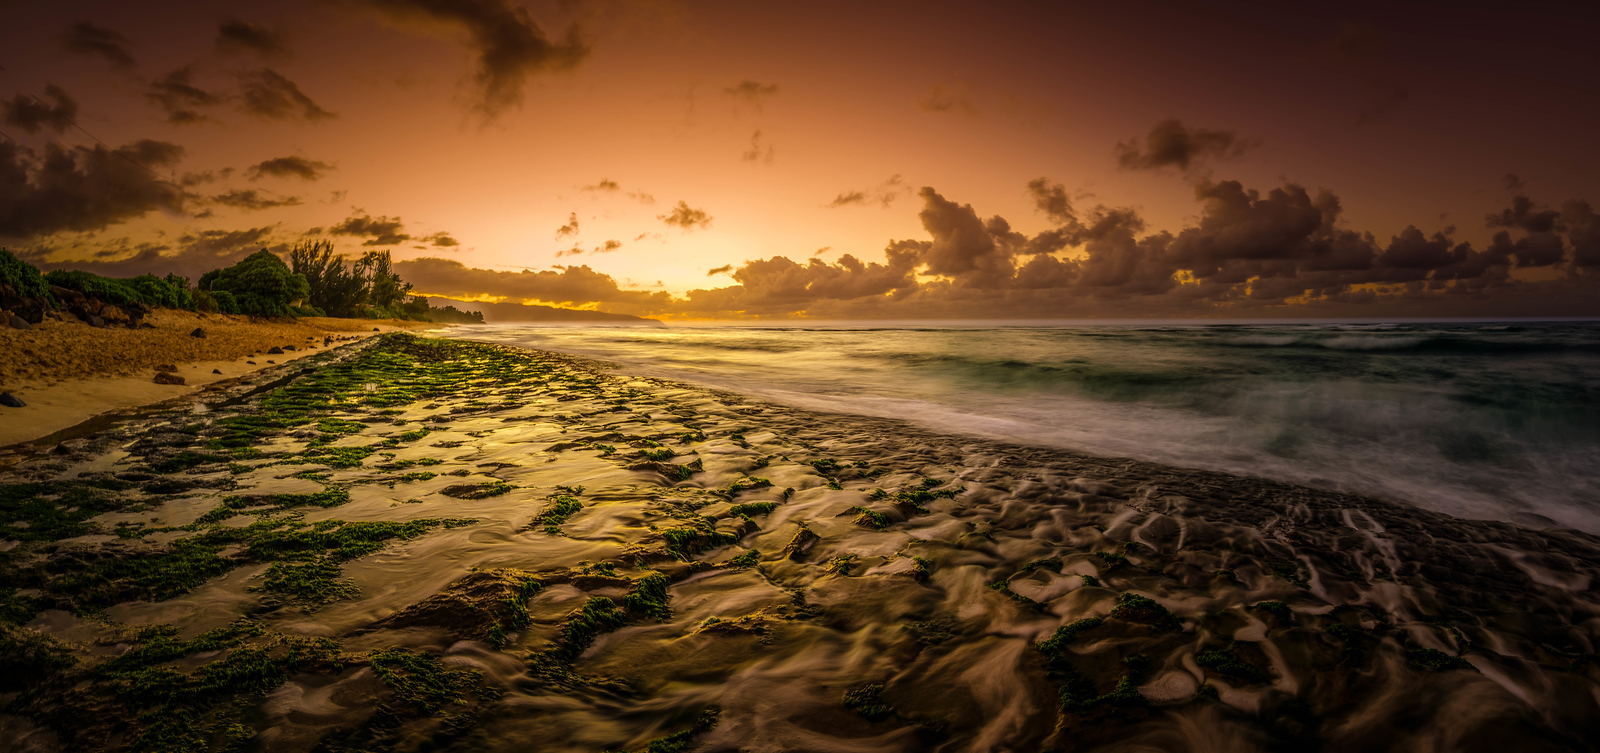 Turtle Beach Sunset